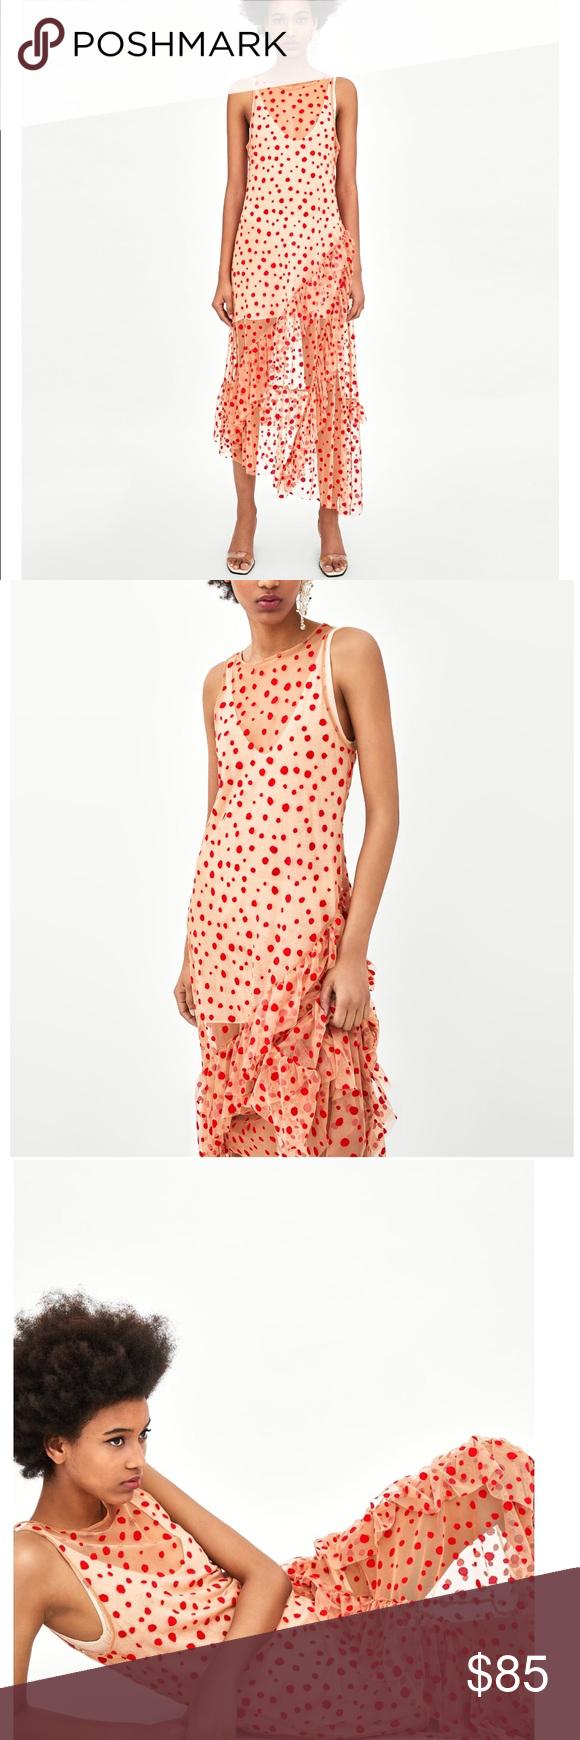 f9294979 GORGEOUS NWT ZARA Semi Sheer Polka Dot Dress New with tags. Slip under dress  not included. Bloggers favorite! Zara Dresses Midi